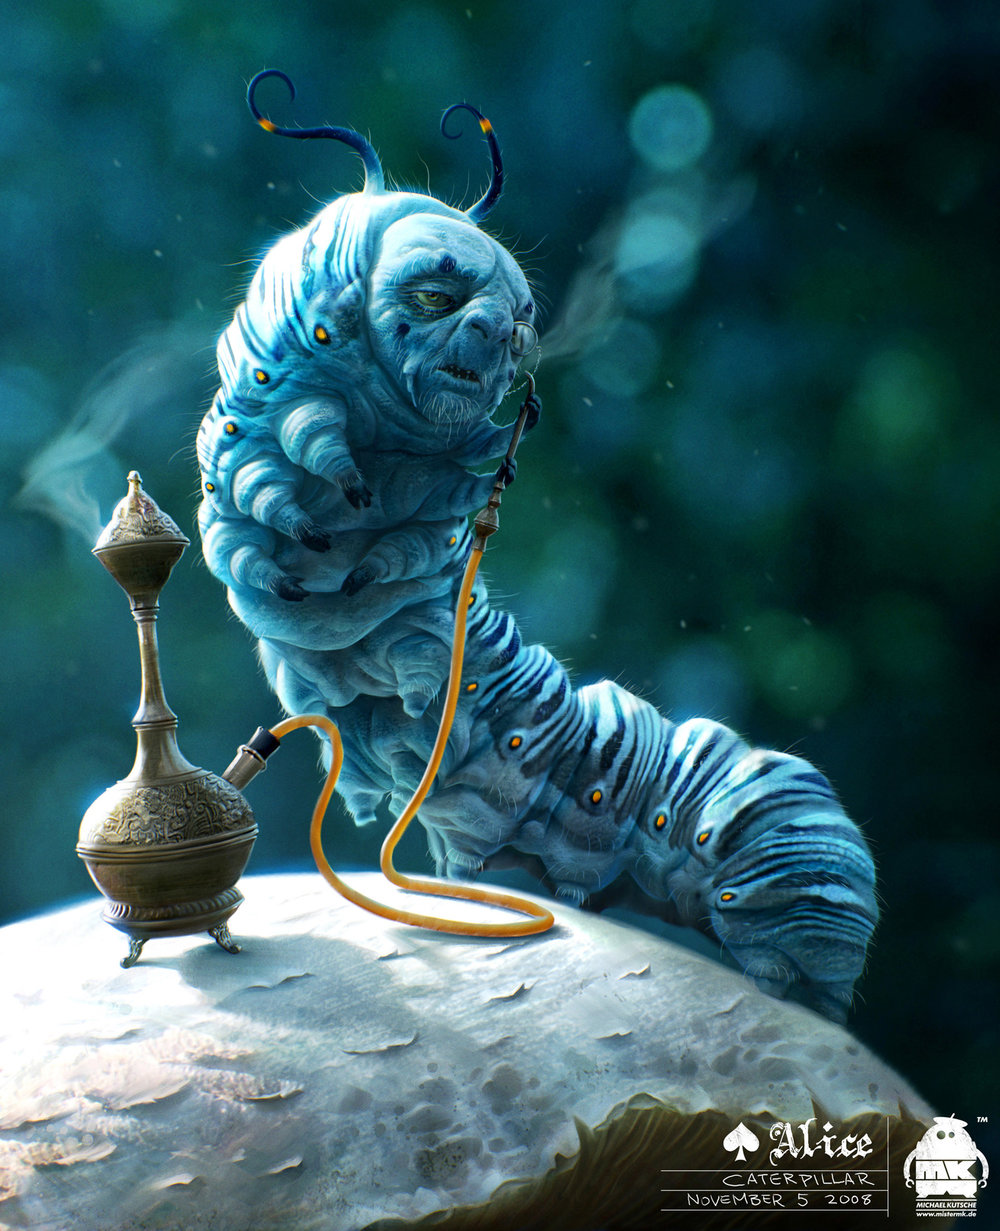 Caterpillar_Concept_c7.jpg